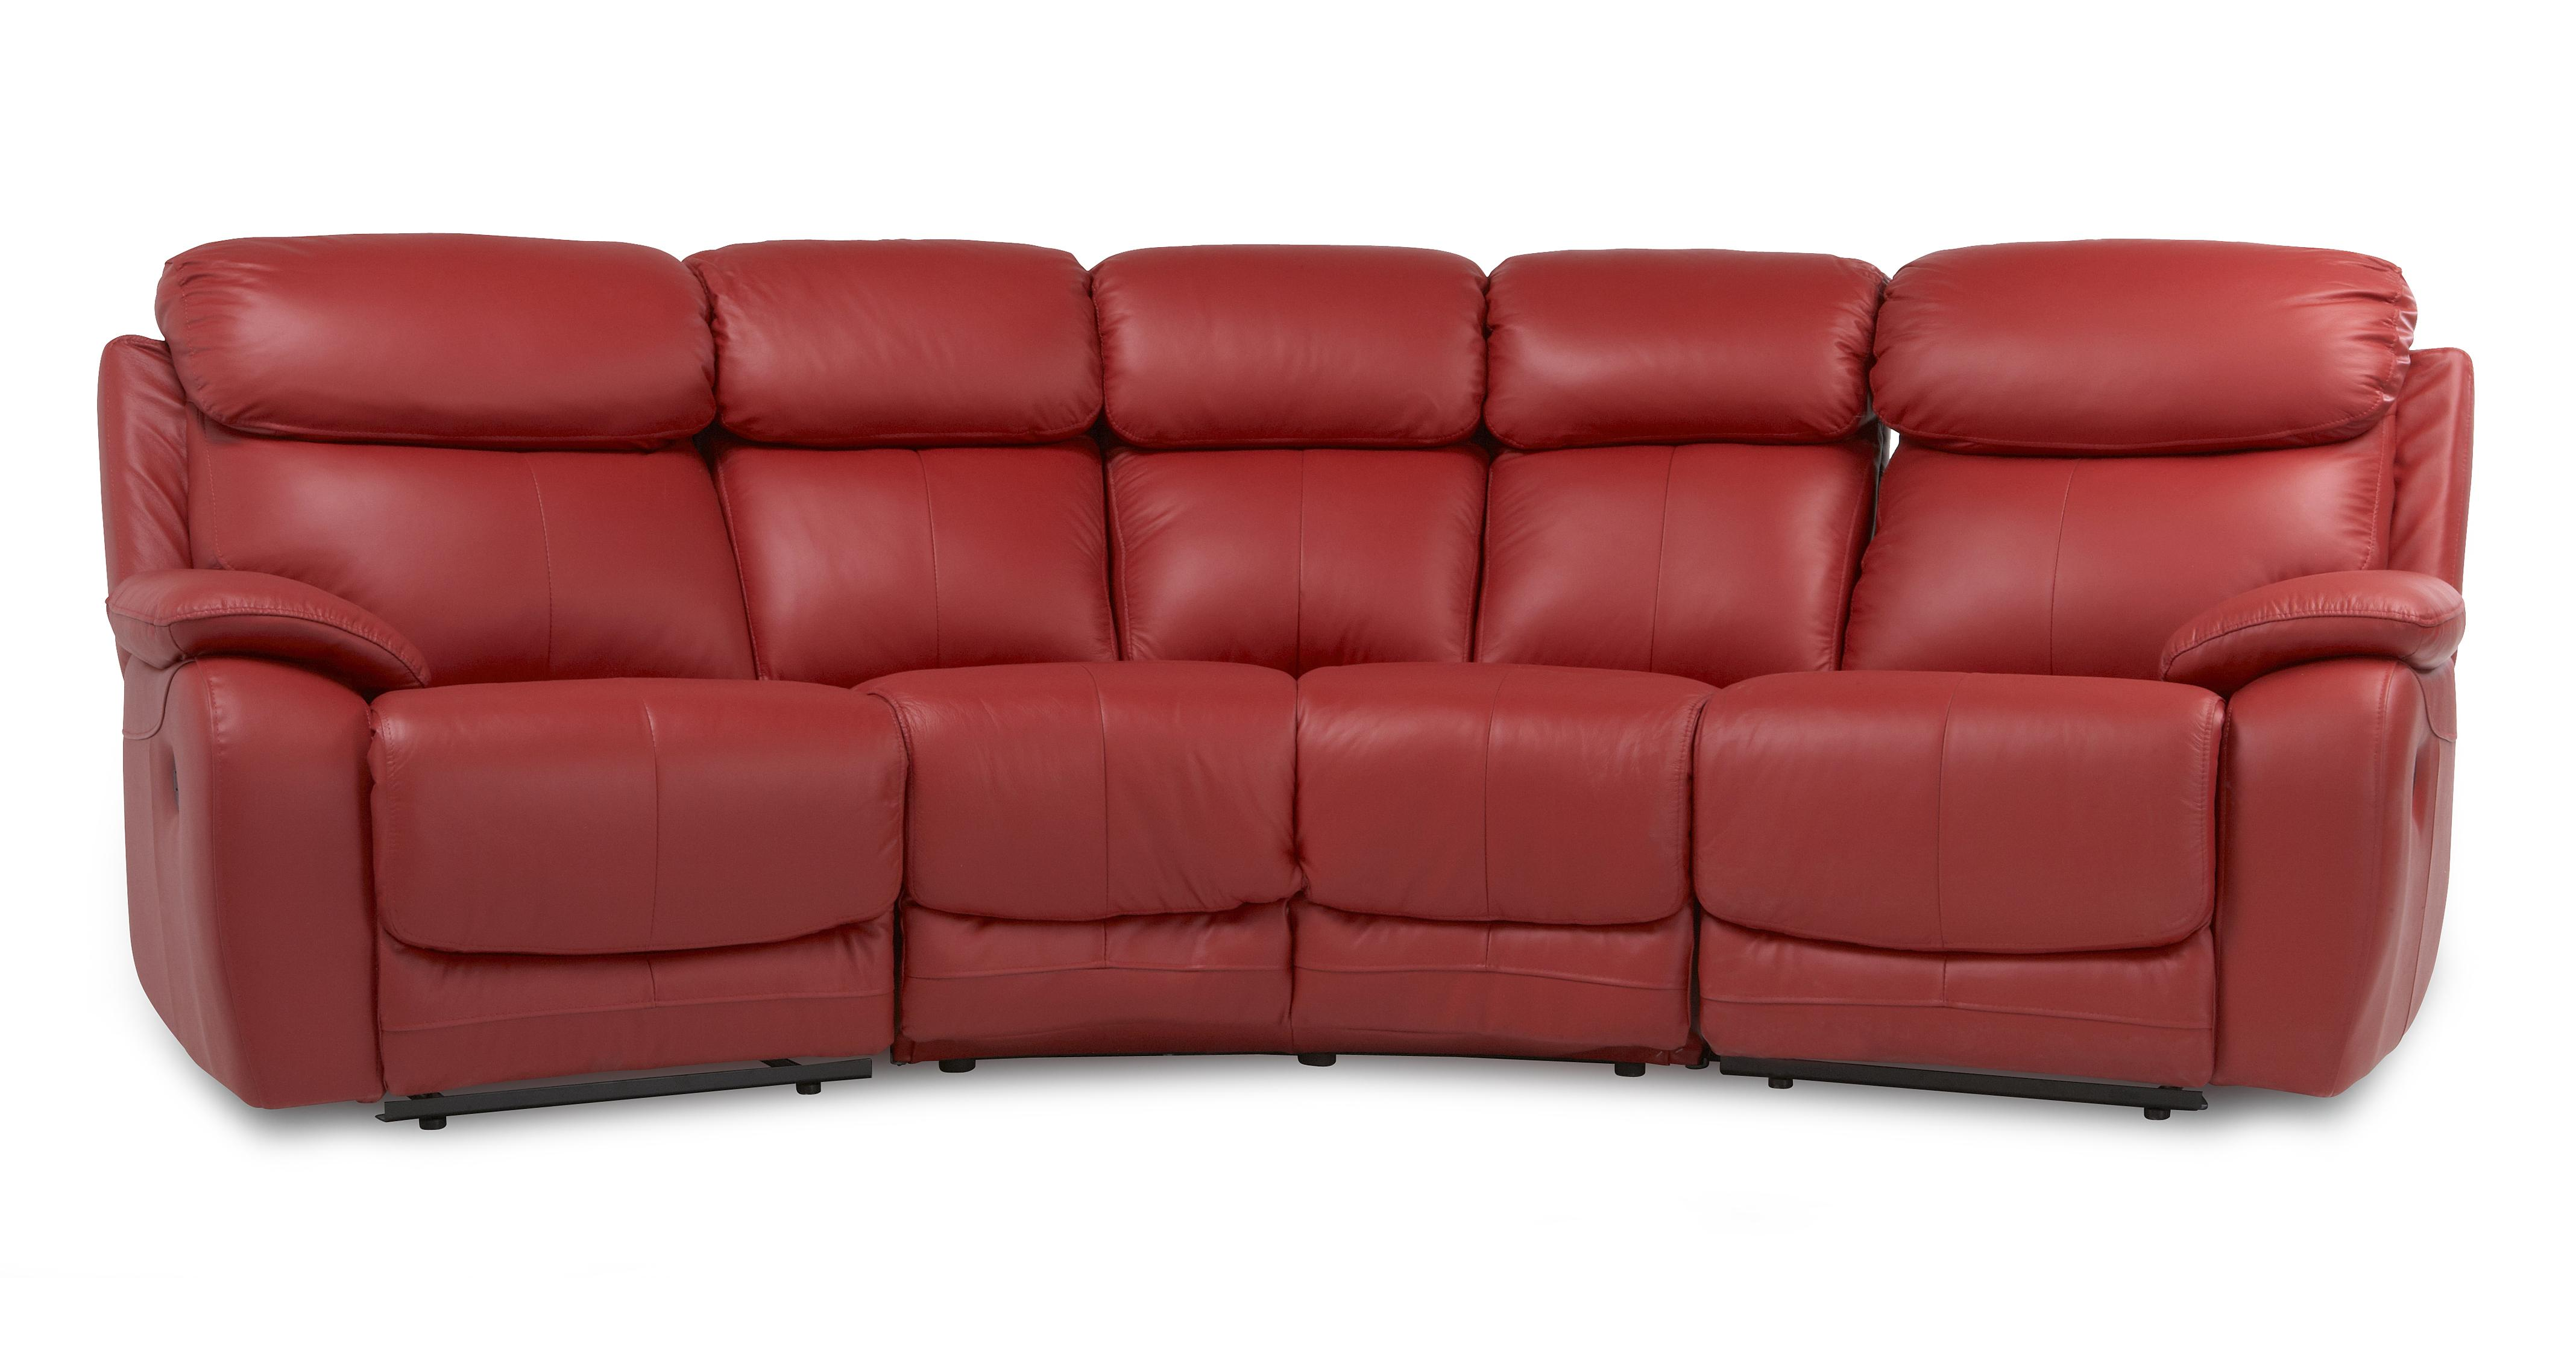 4 seater recliner sofa mariposa gebraucht daytona curved manual double peru dfs